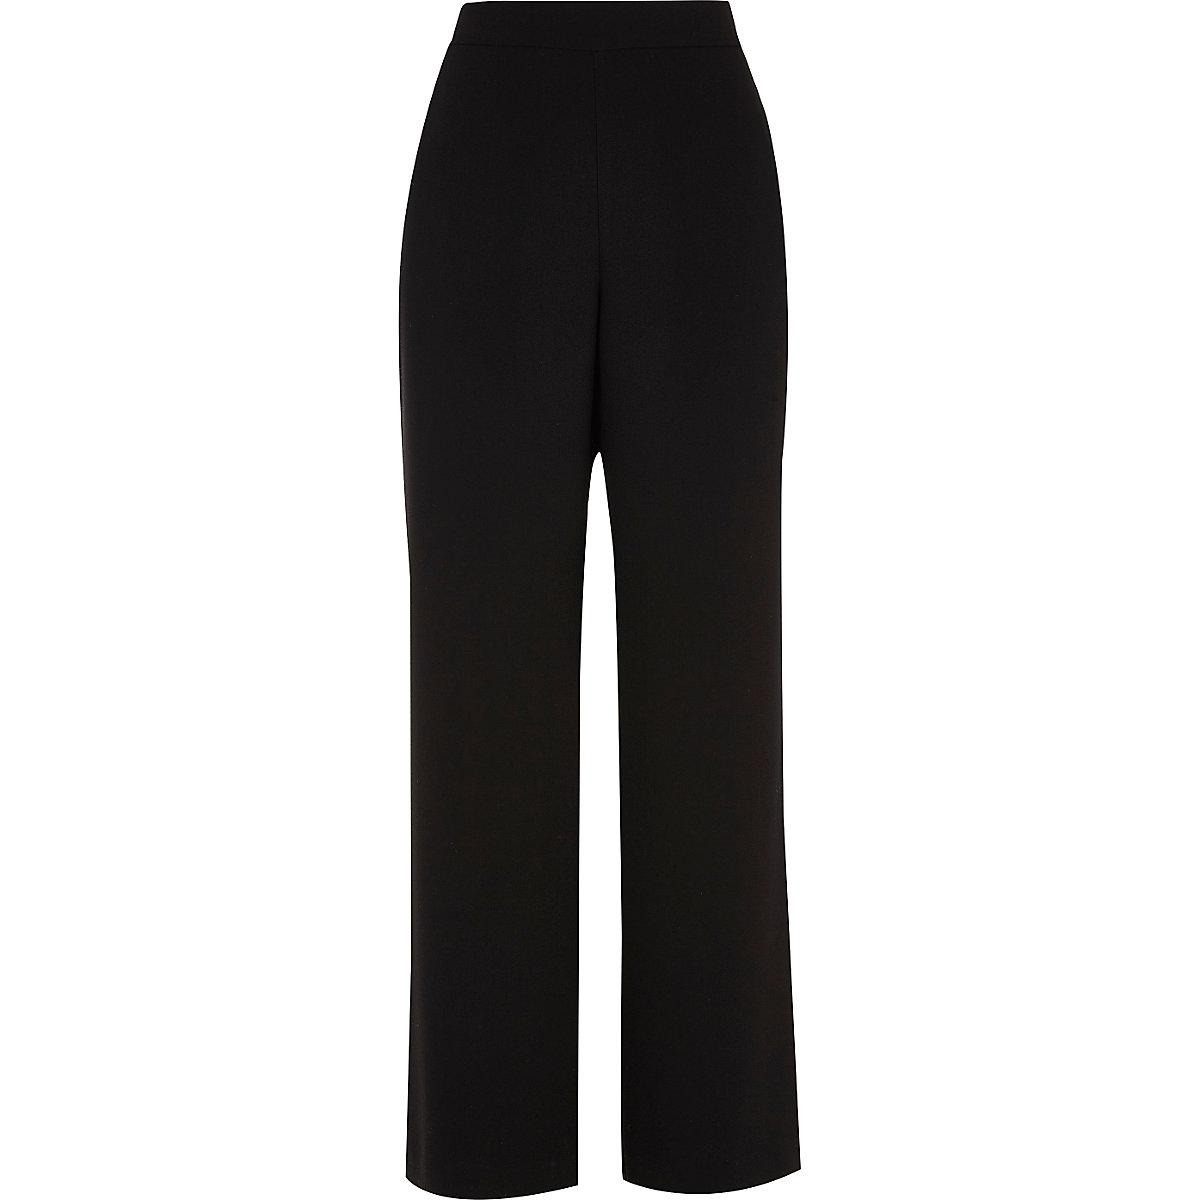 Black soft wide leg trousers